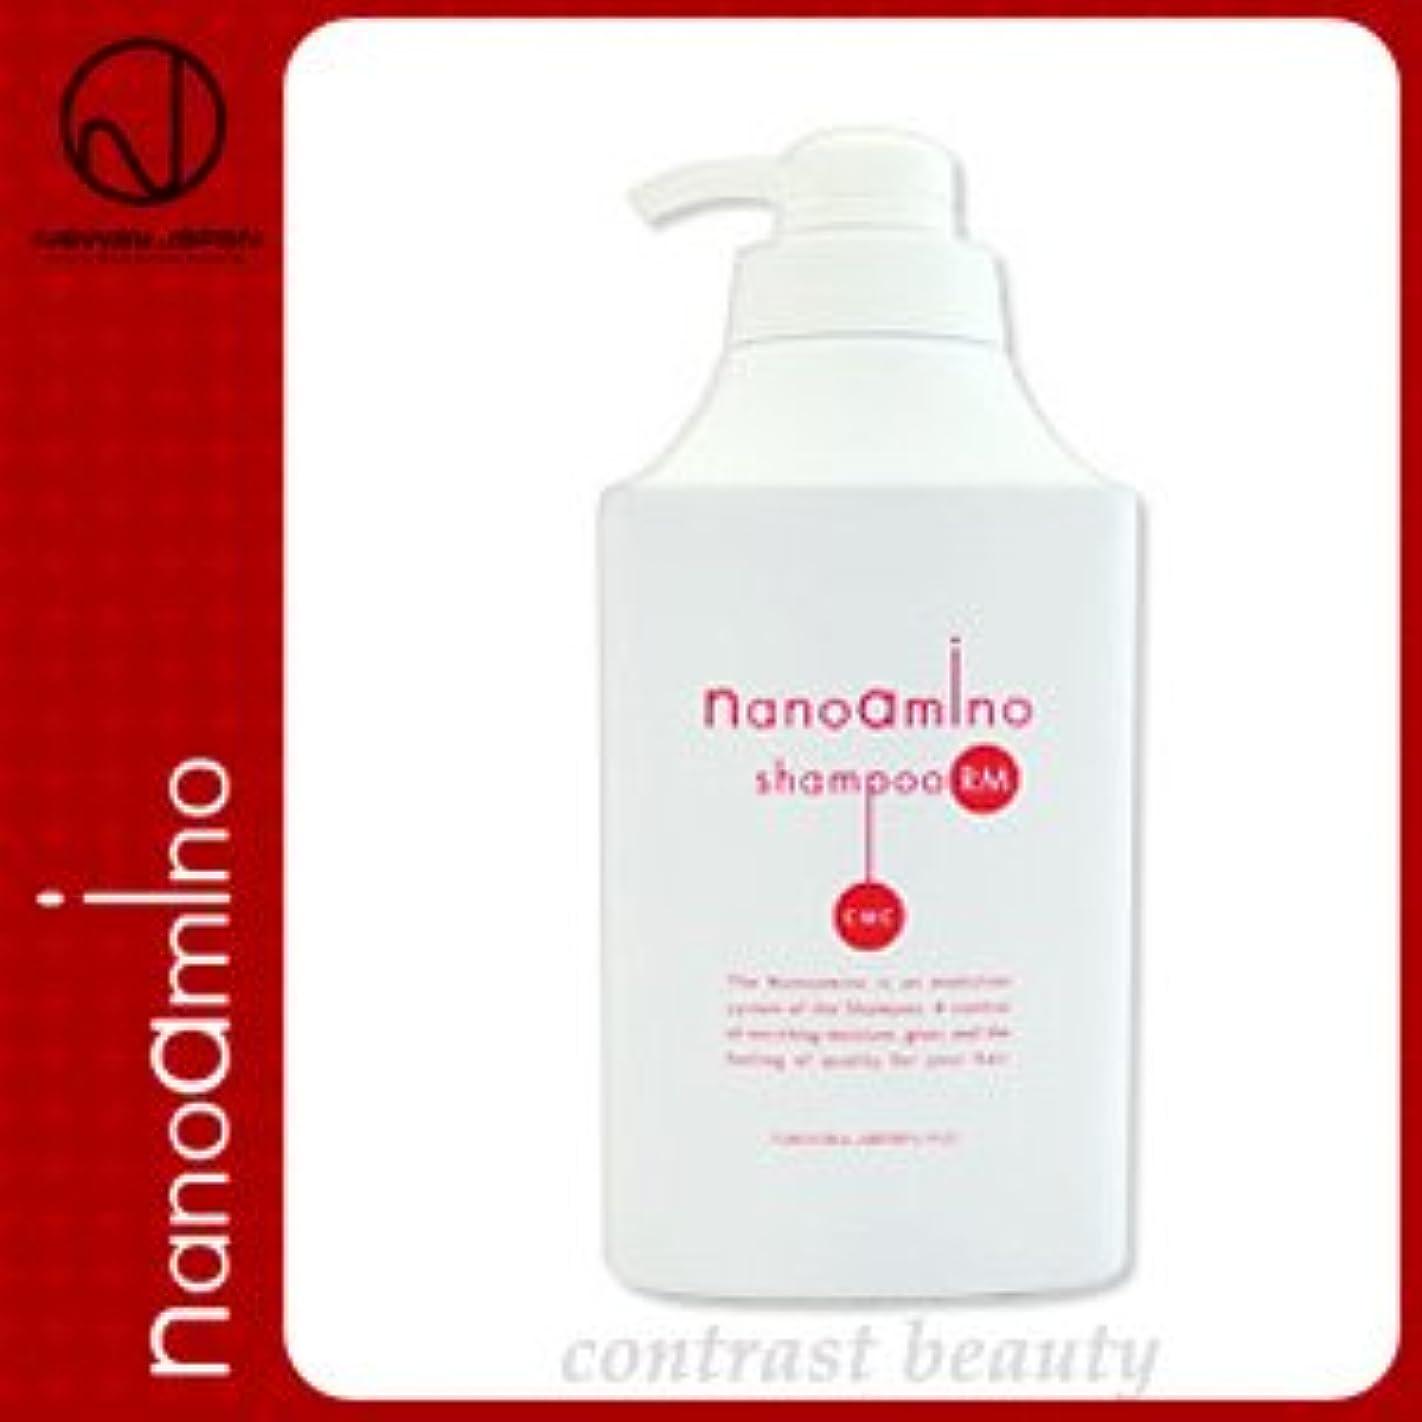 【X2個セット】 ニューウェイジャパン/NEWAY JAPAN ナノアミノ シャンプー RM 1000ml ポンプ付き容器入り